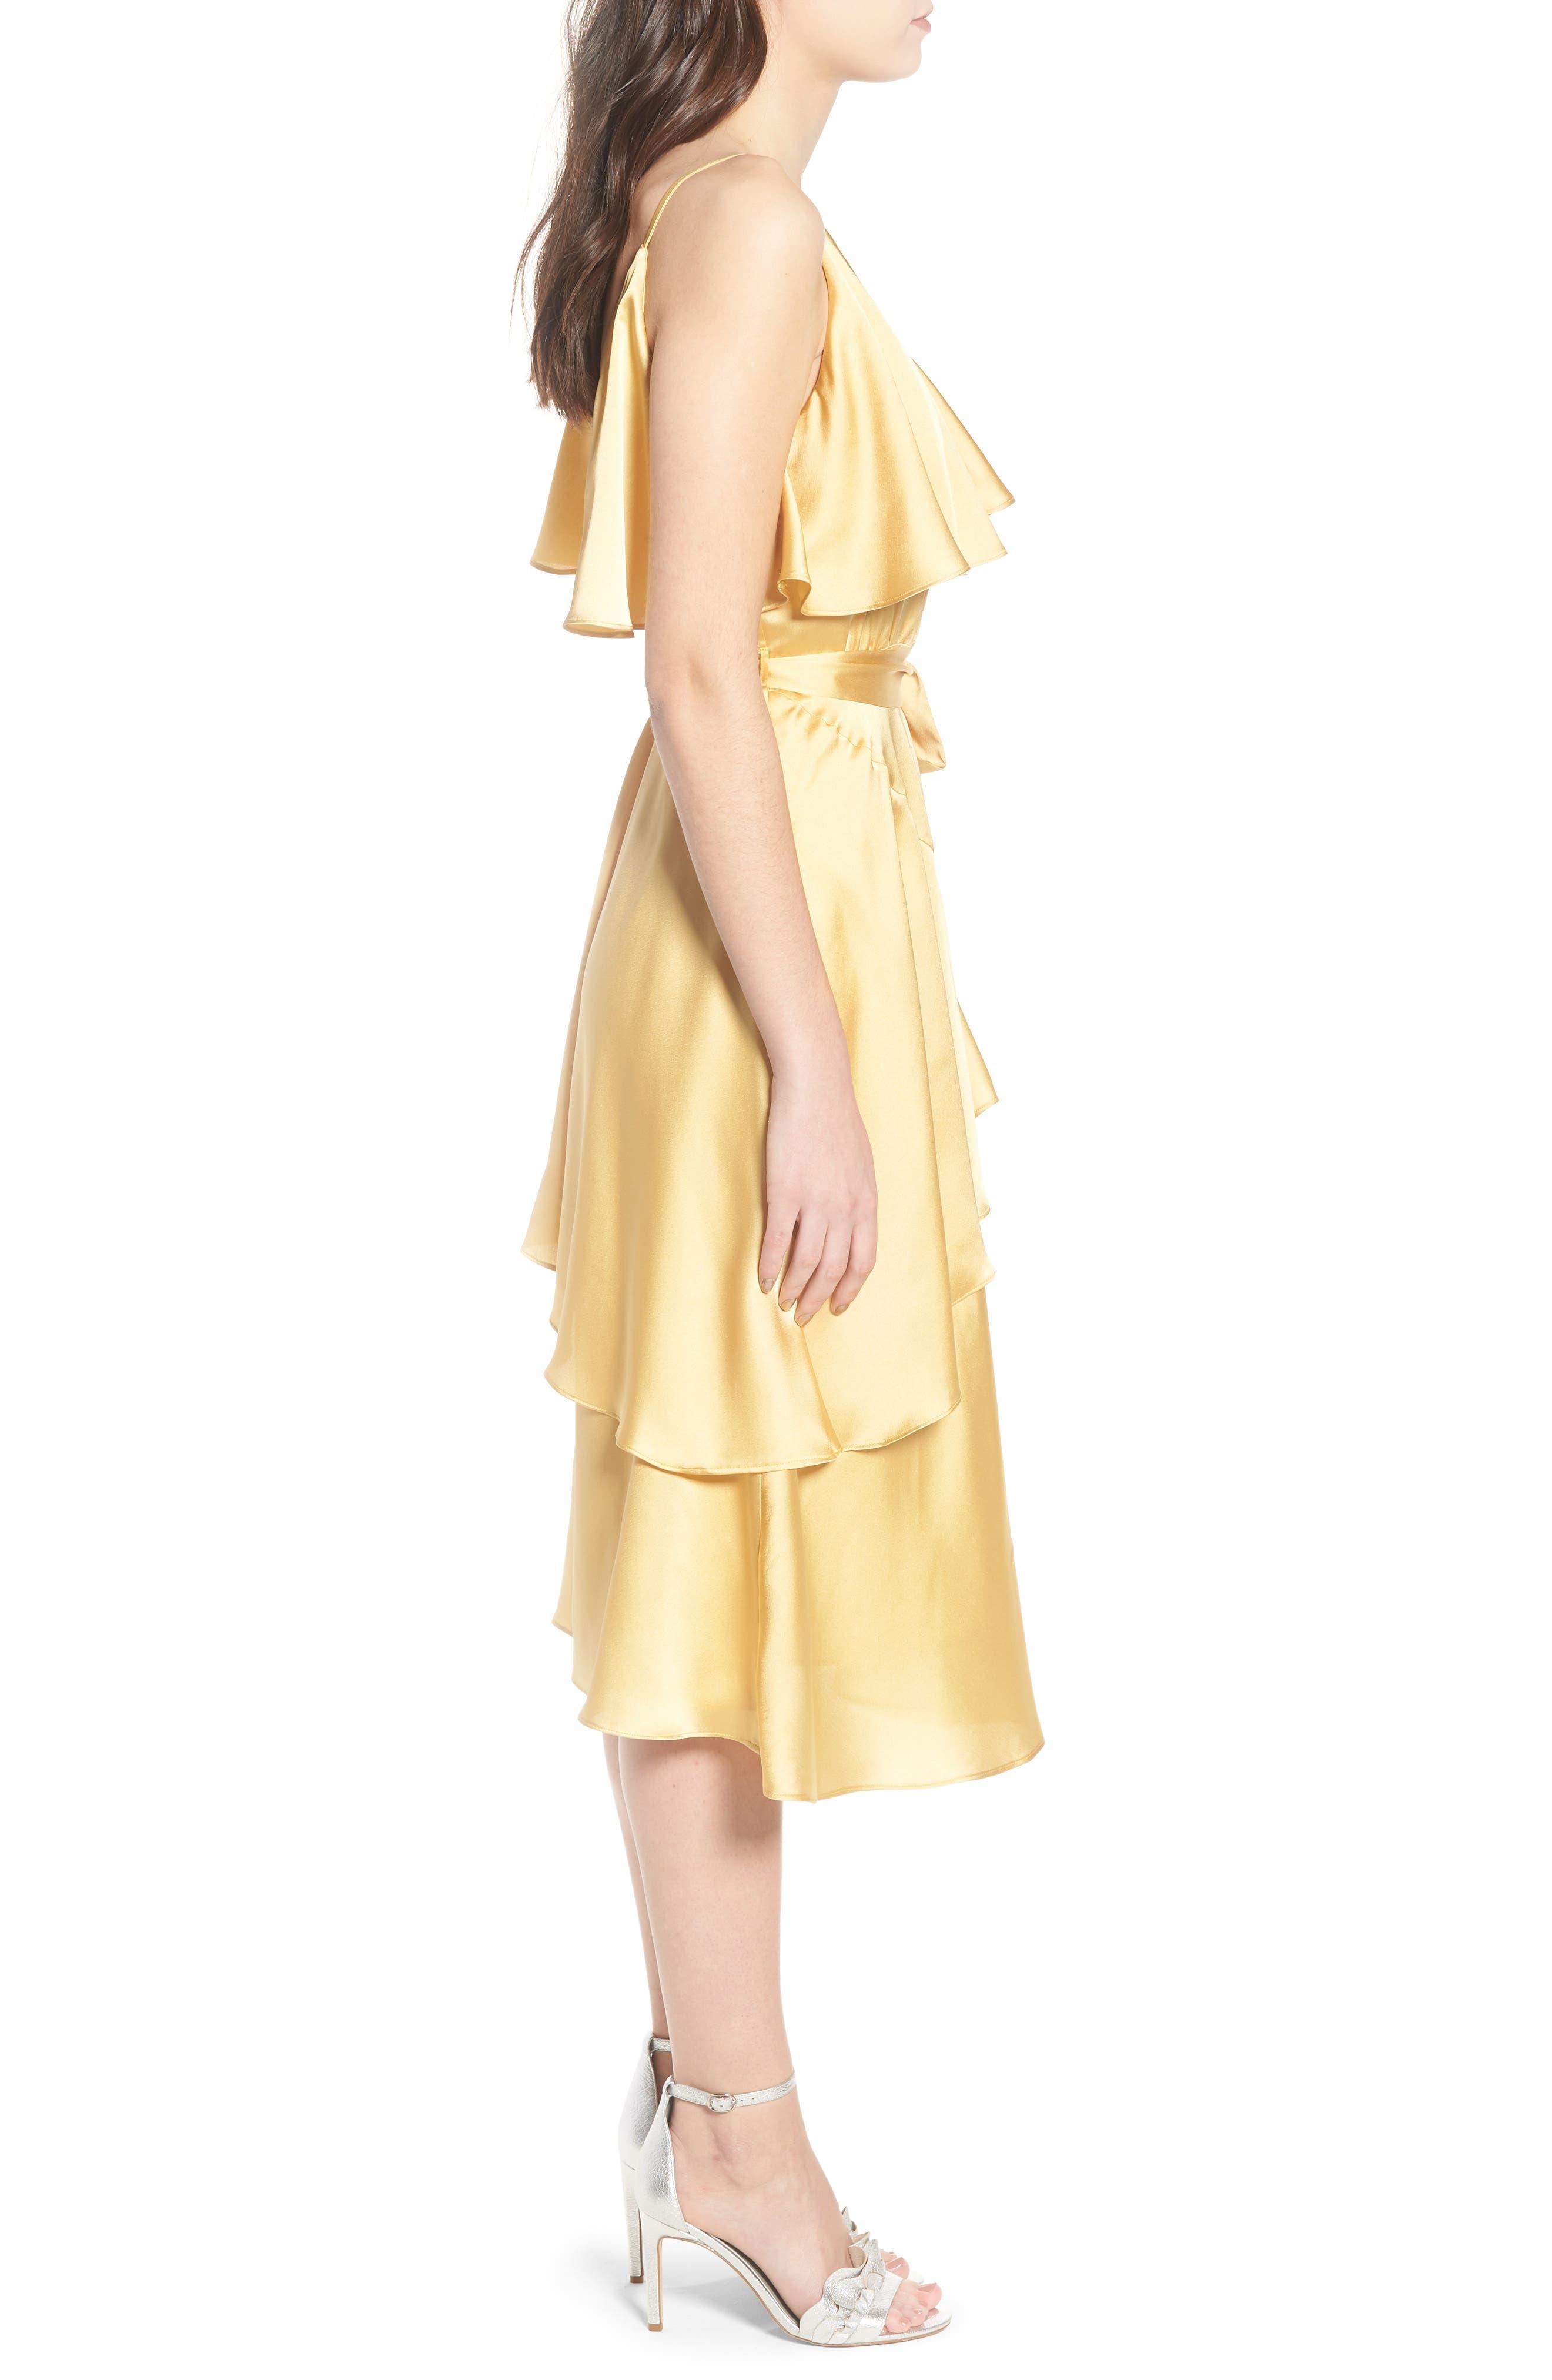 Deconstructed Tea Dress,                             Alternate thumbnail 4, color,                             Yellow